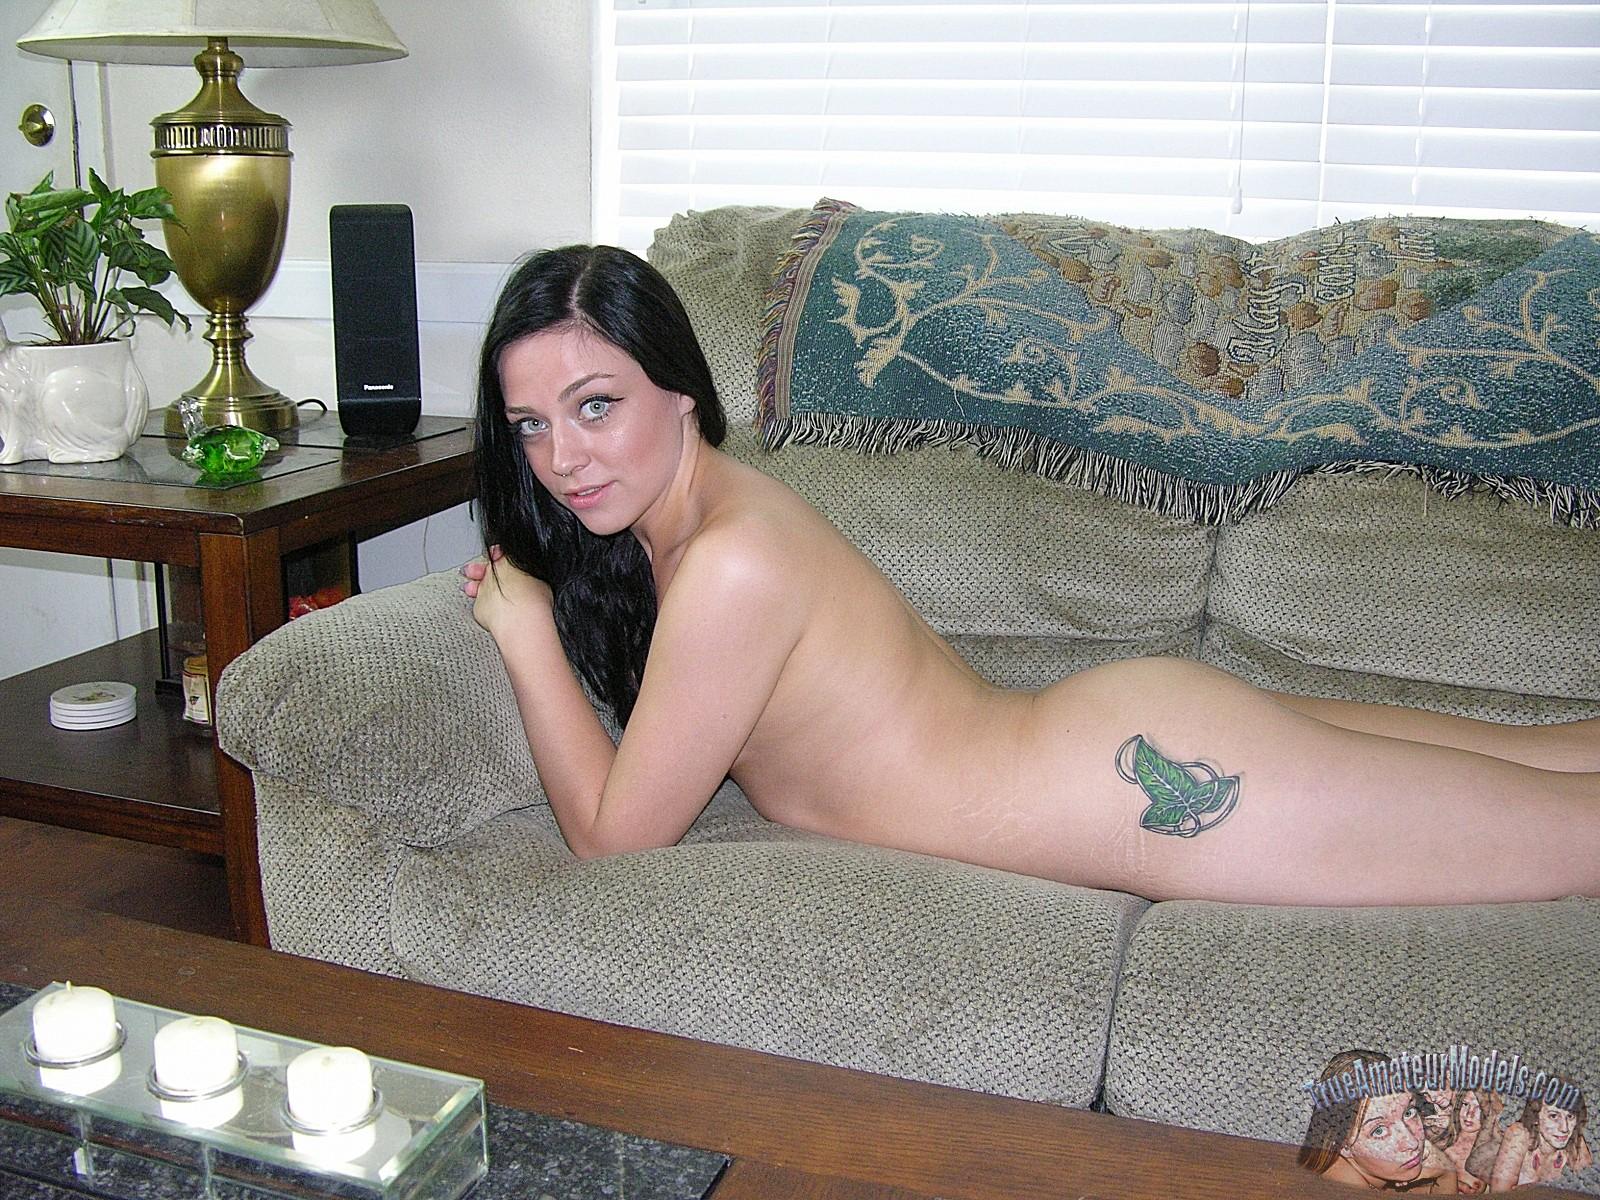 Finnish boobs amateur model nude thumbs